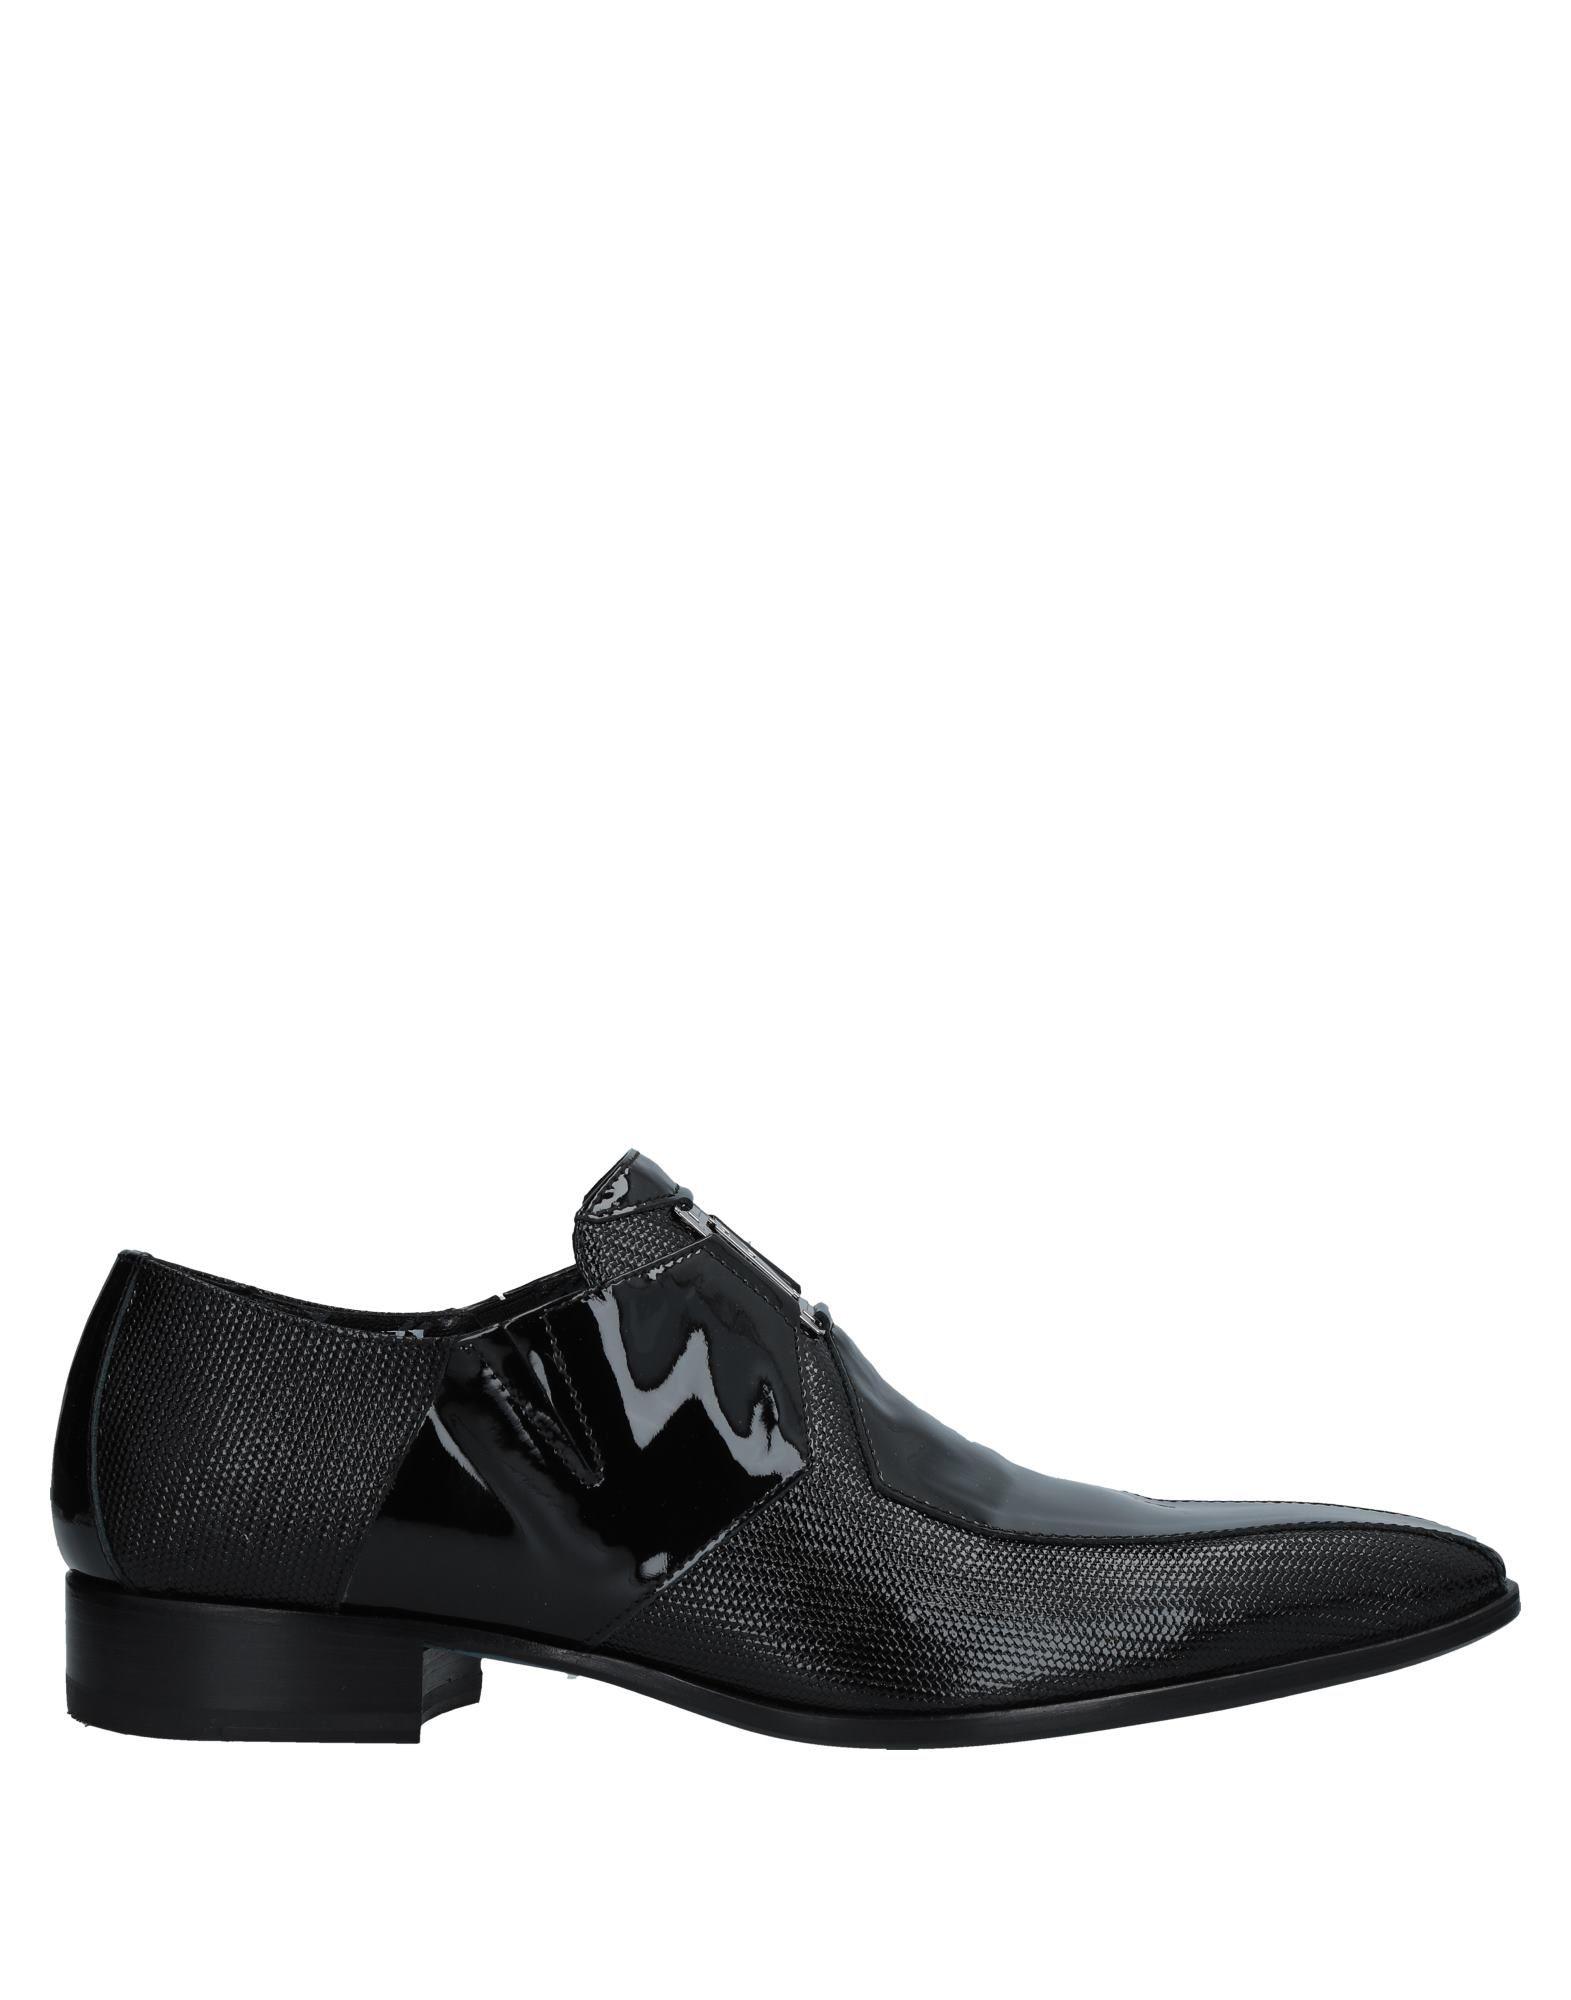 Carlo Pignatelli Outside Mokassins Herren  11535228HC Gute Qualität beliebte Schuhe